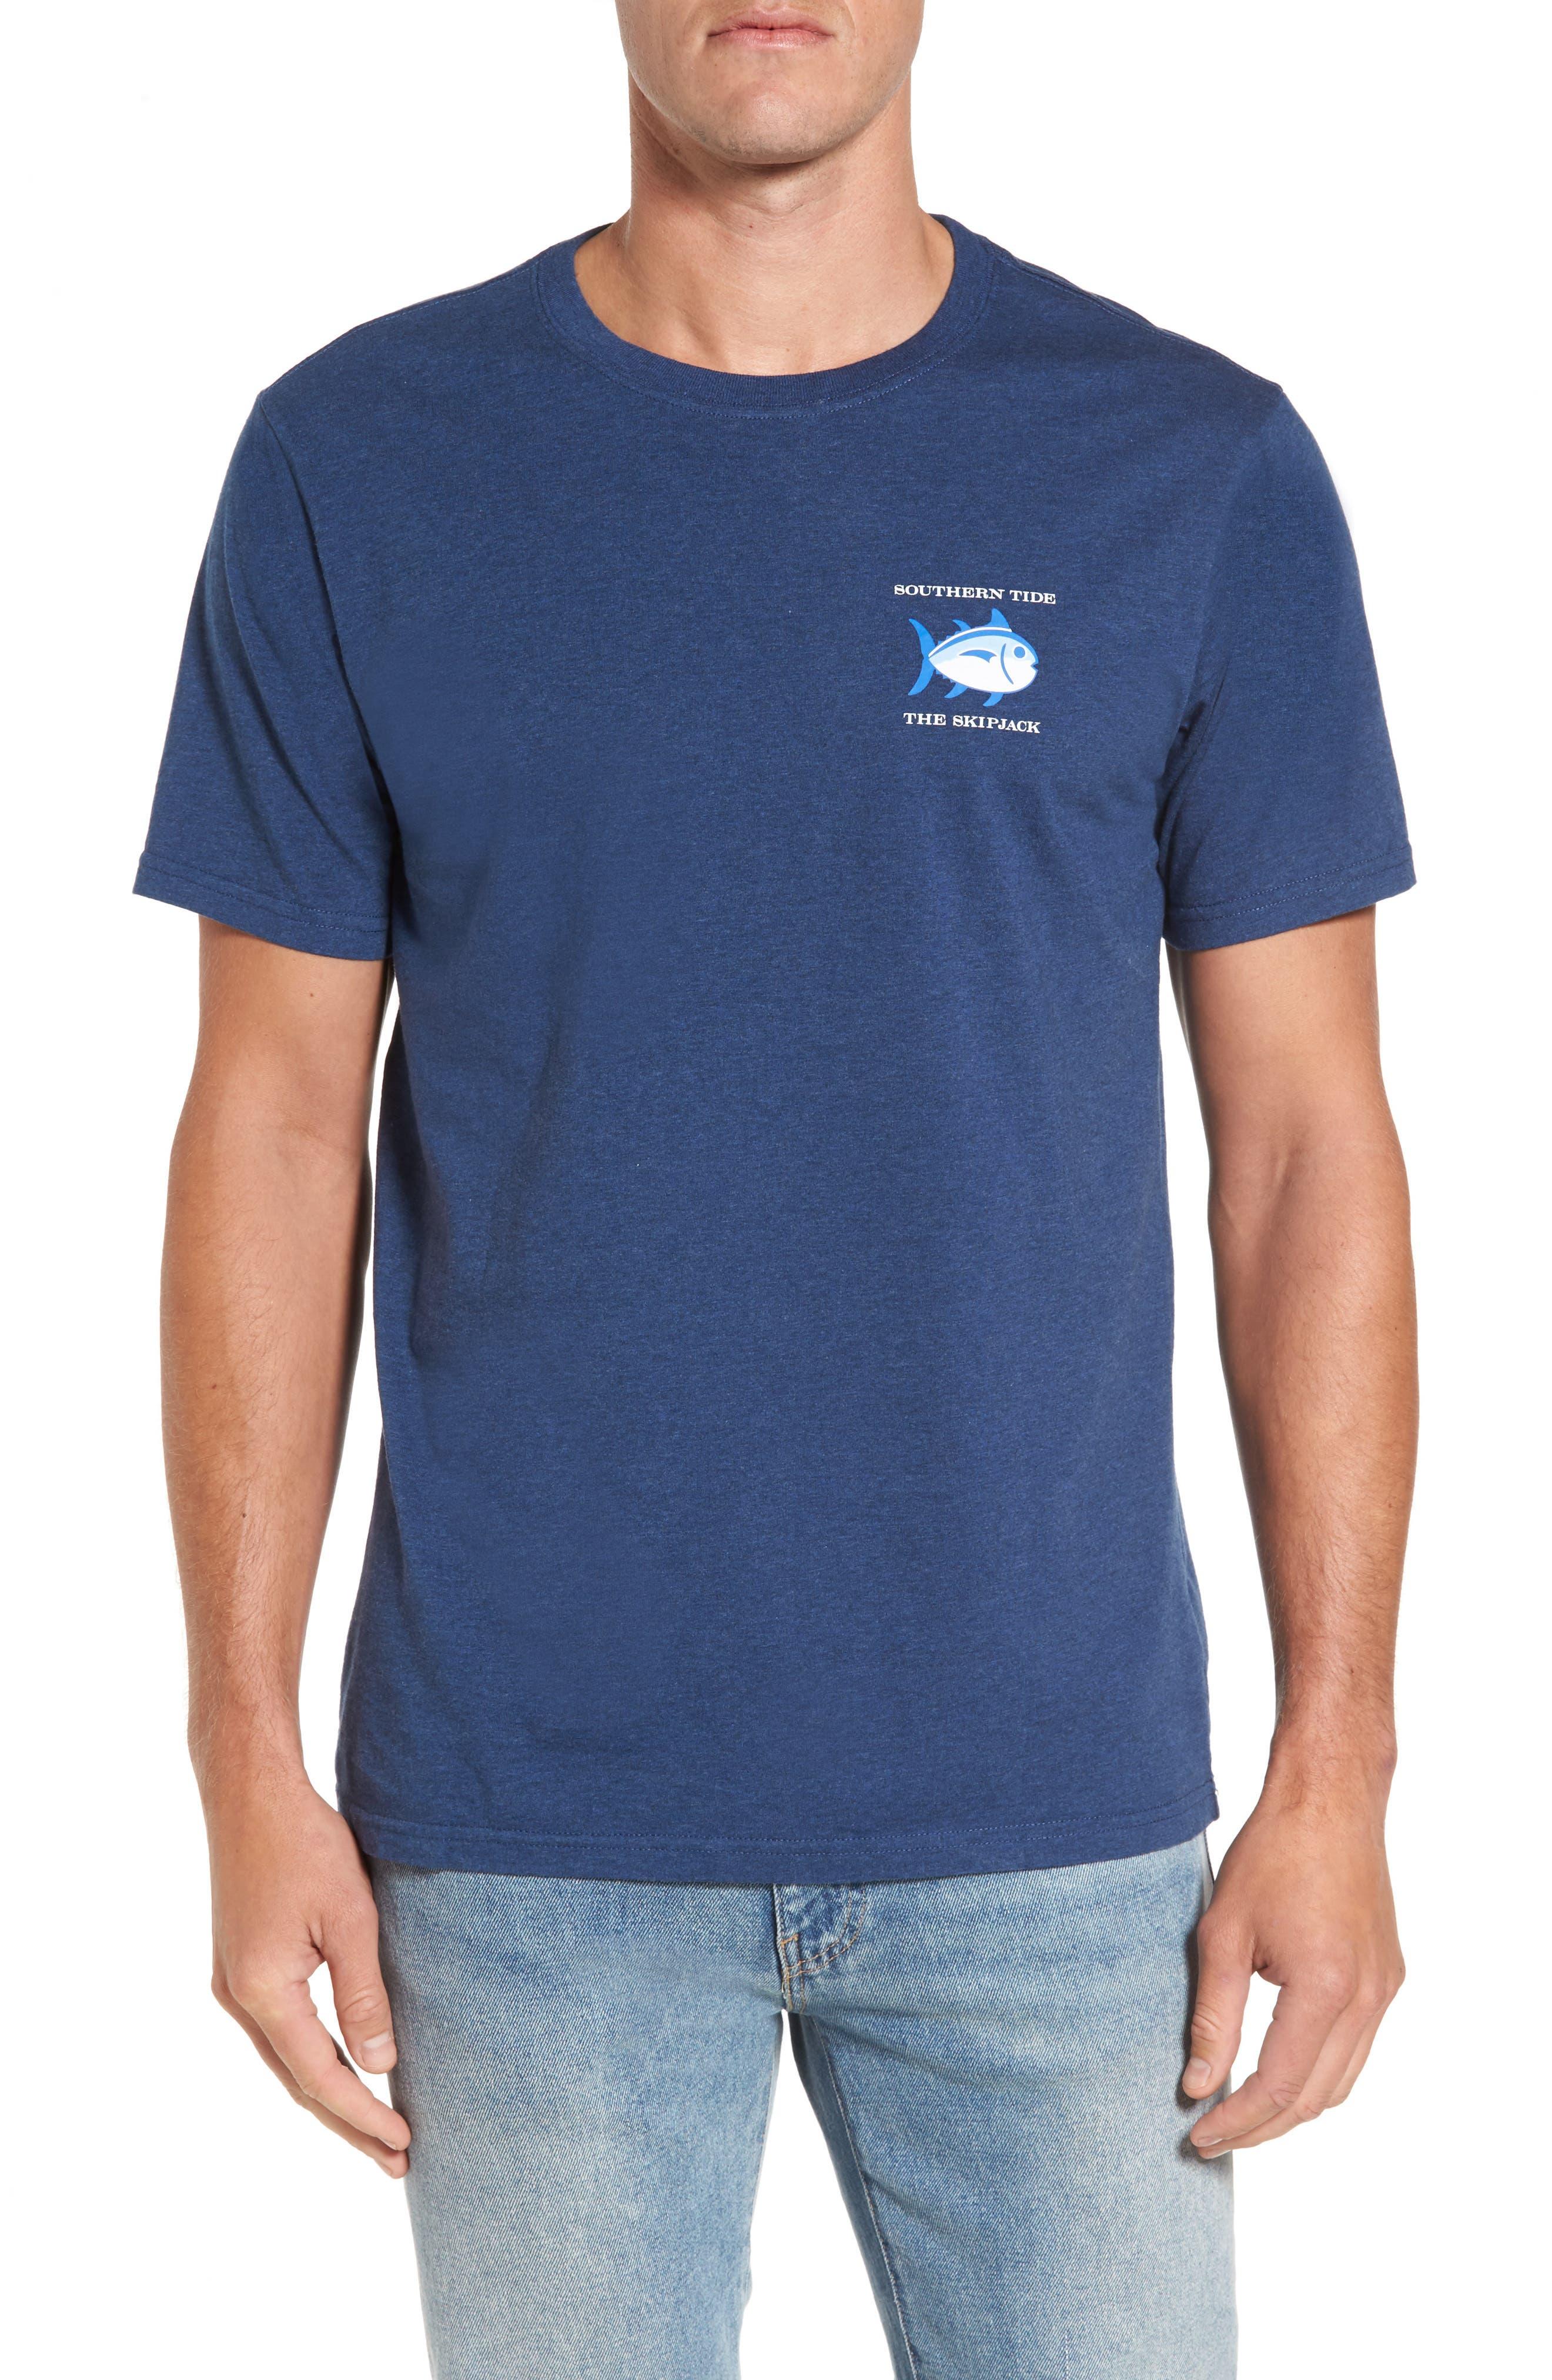 Southern Tide Original Graphic T-Shirt